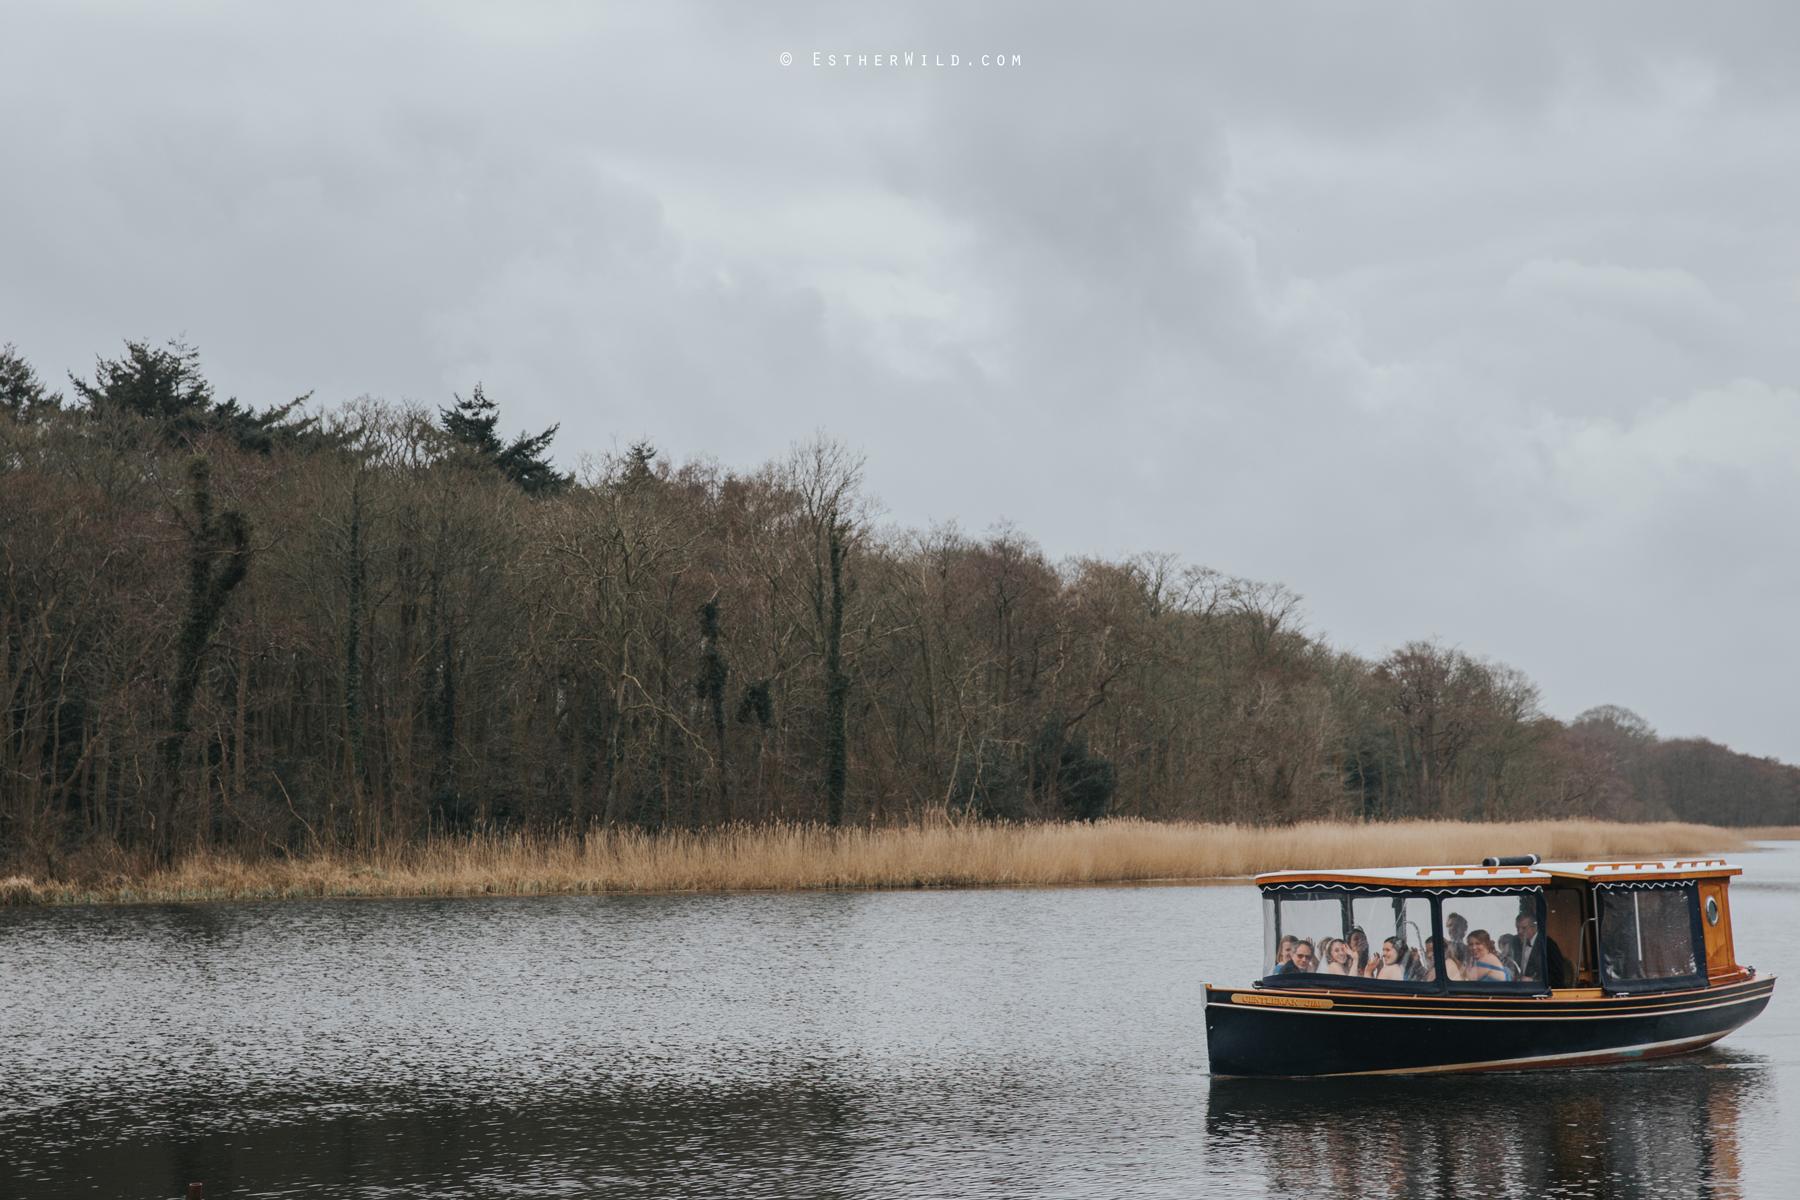 The_BoatHouse_Wedding_Venue_Ormesby_Norfolk_Broads_Boat_Wedding_Photography_Esther_Wild_Photographer_IMG_0903.jpg